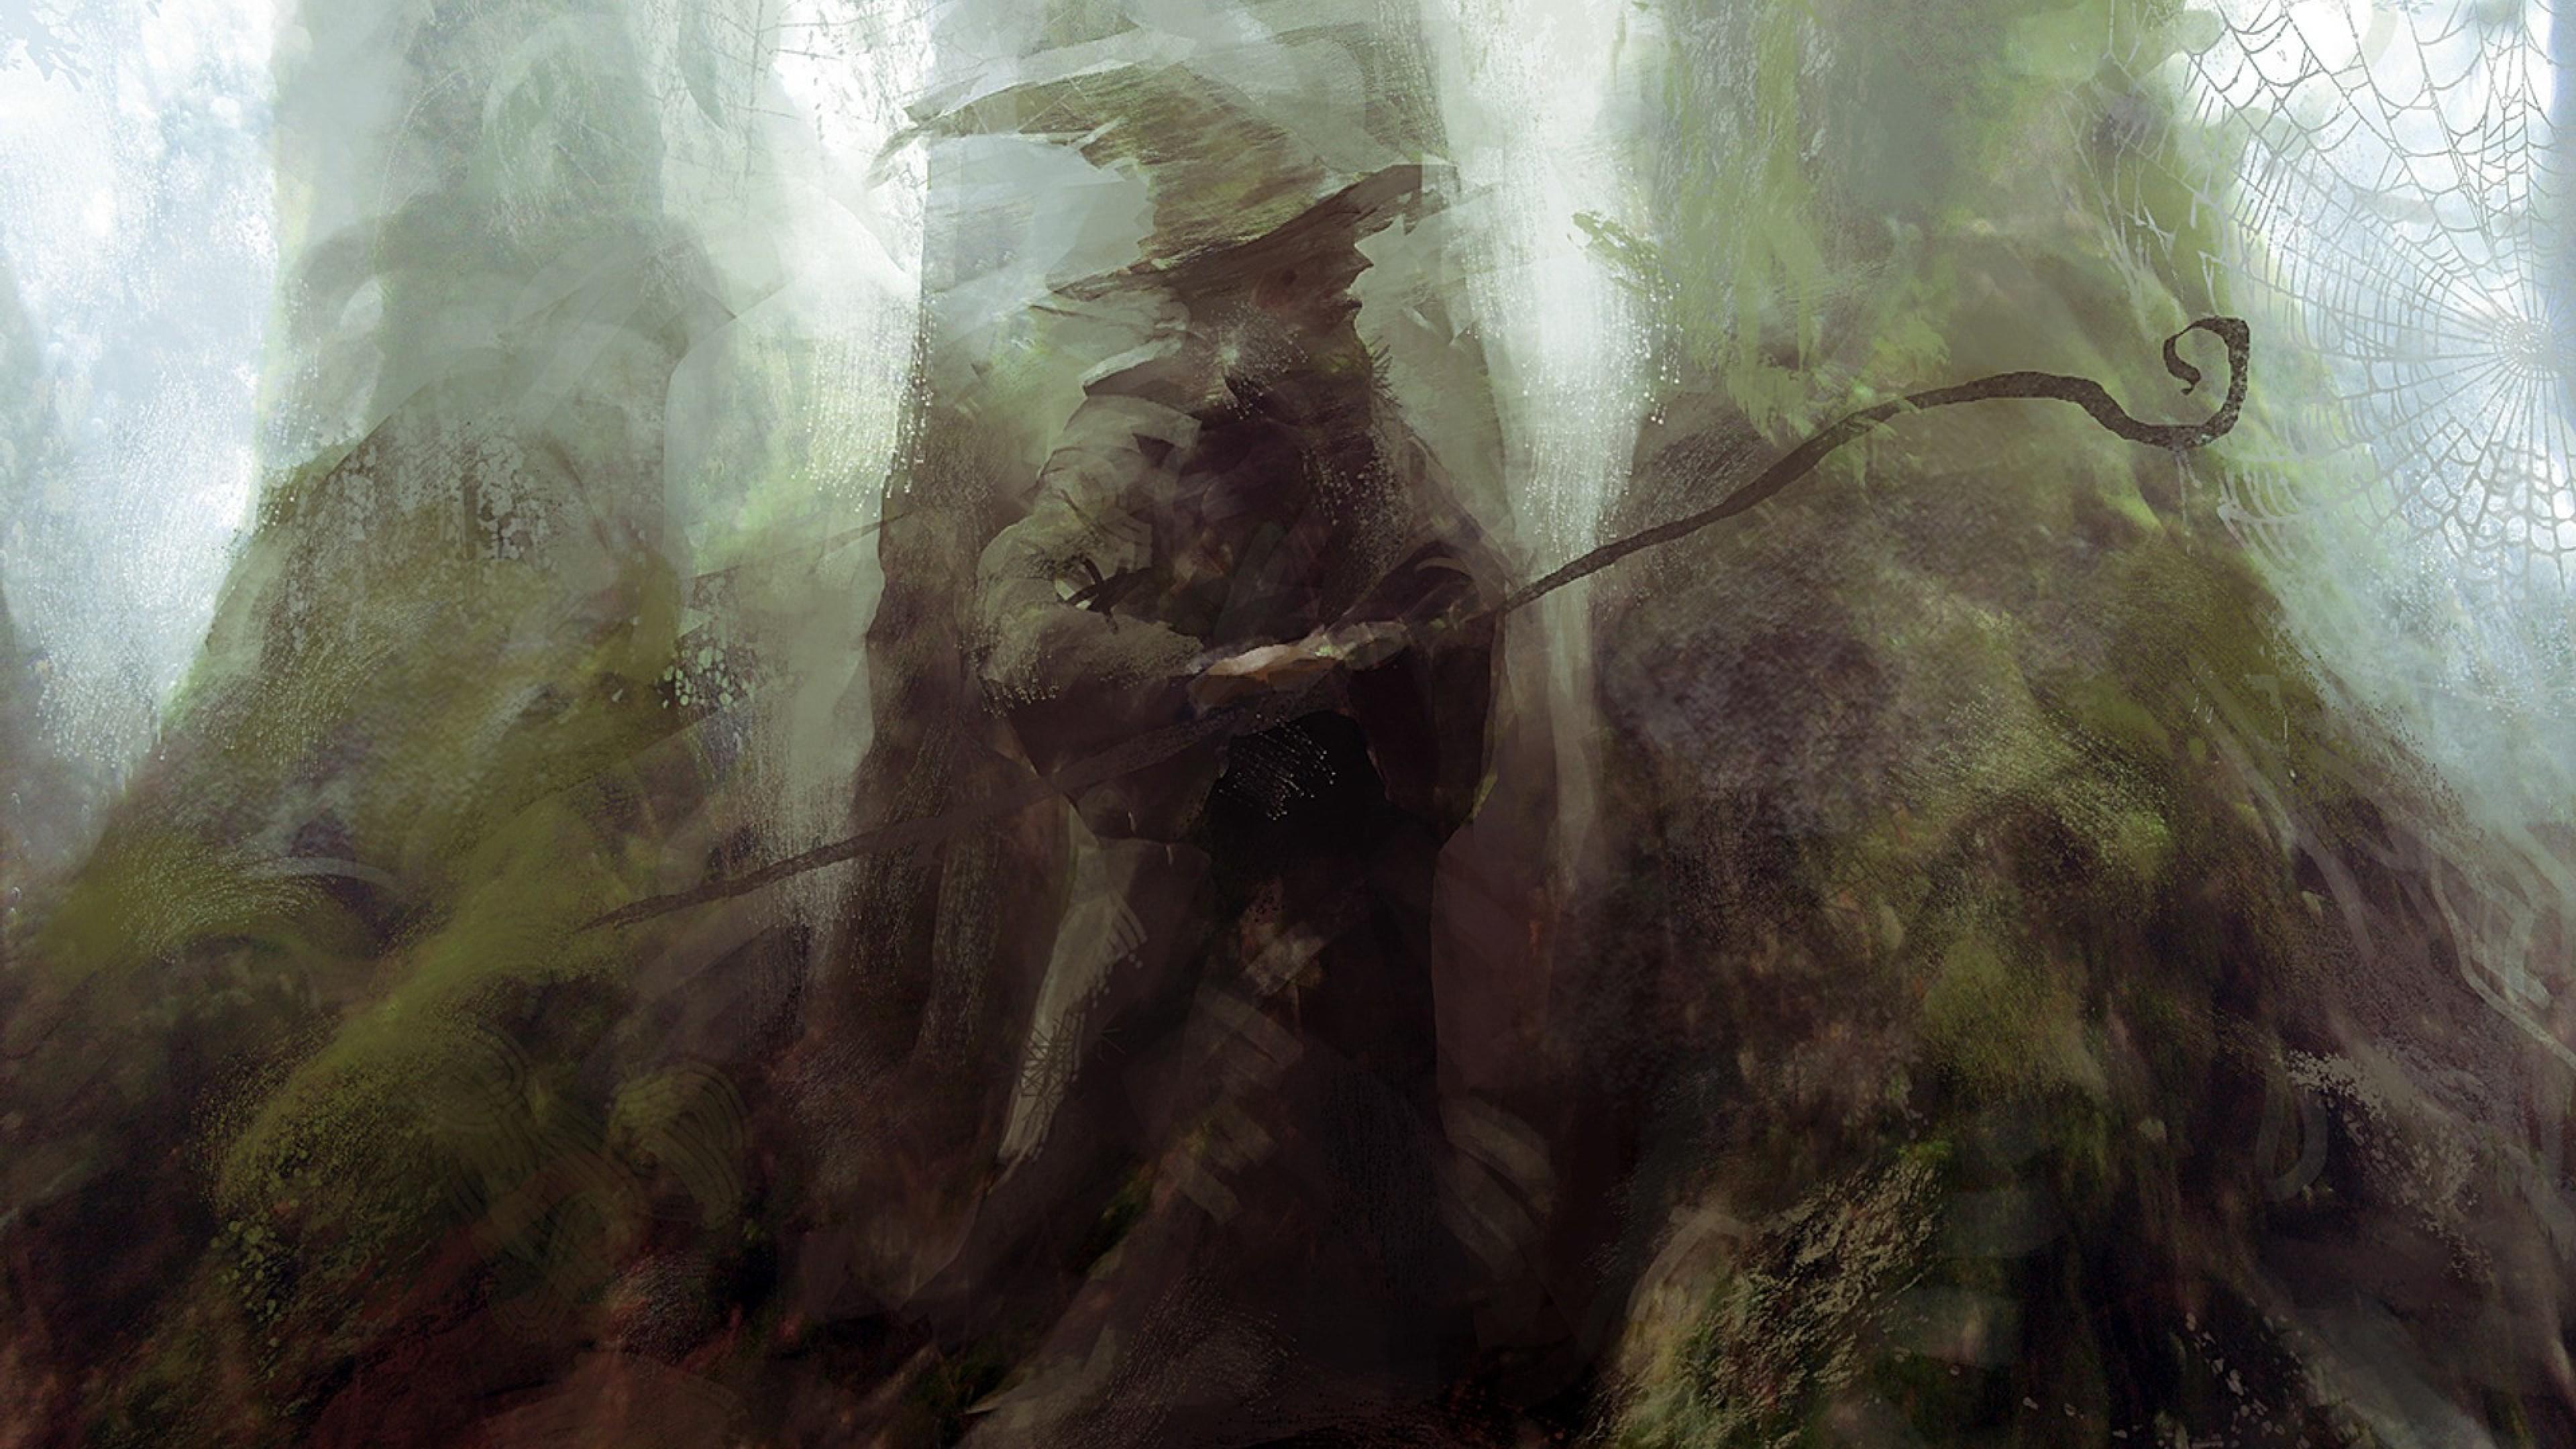 Lord Of The Rings Wizard Magic Hd Wallpaper 4k Ultra Hd Hd